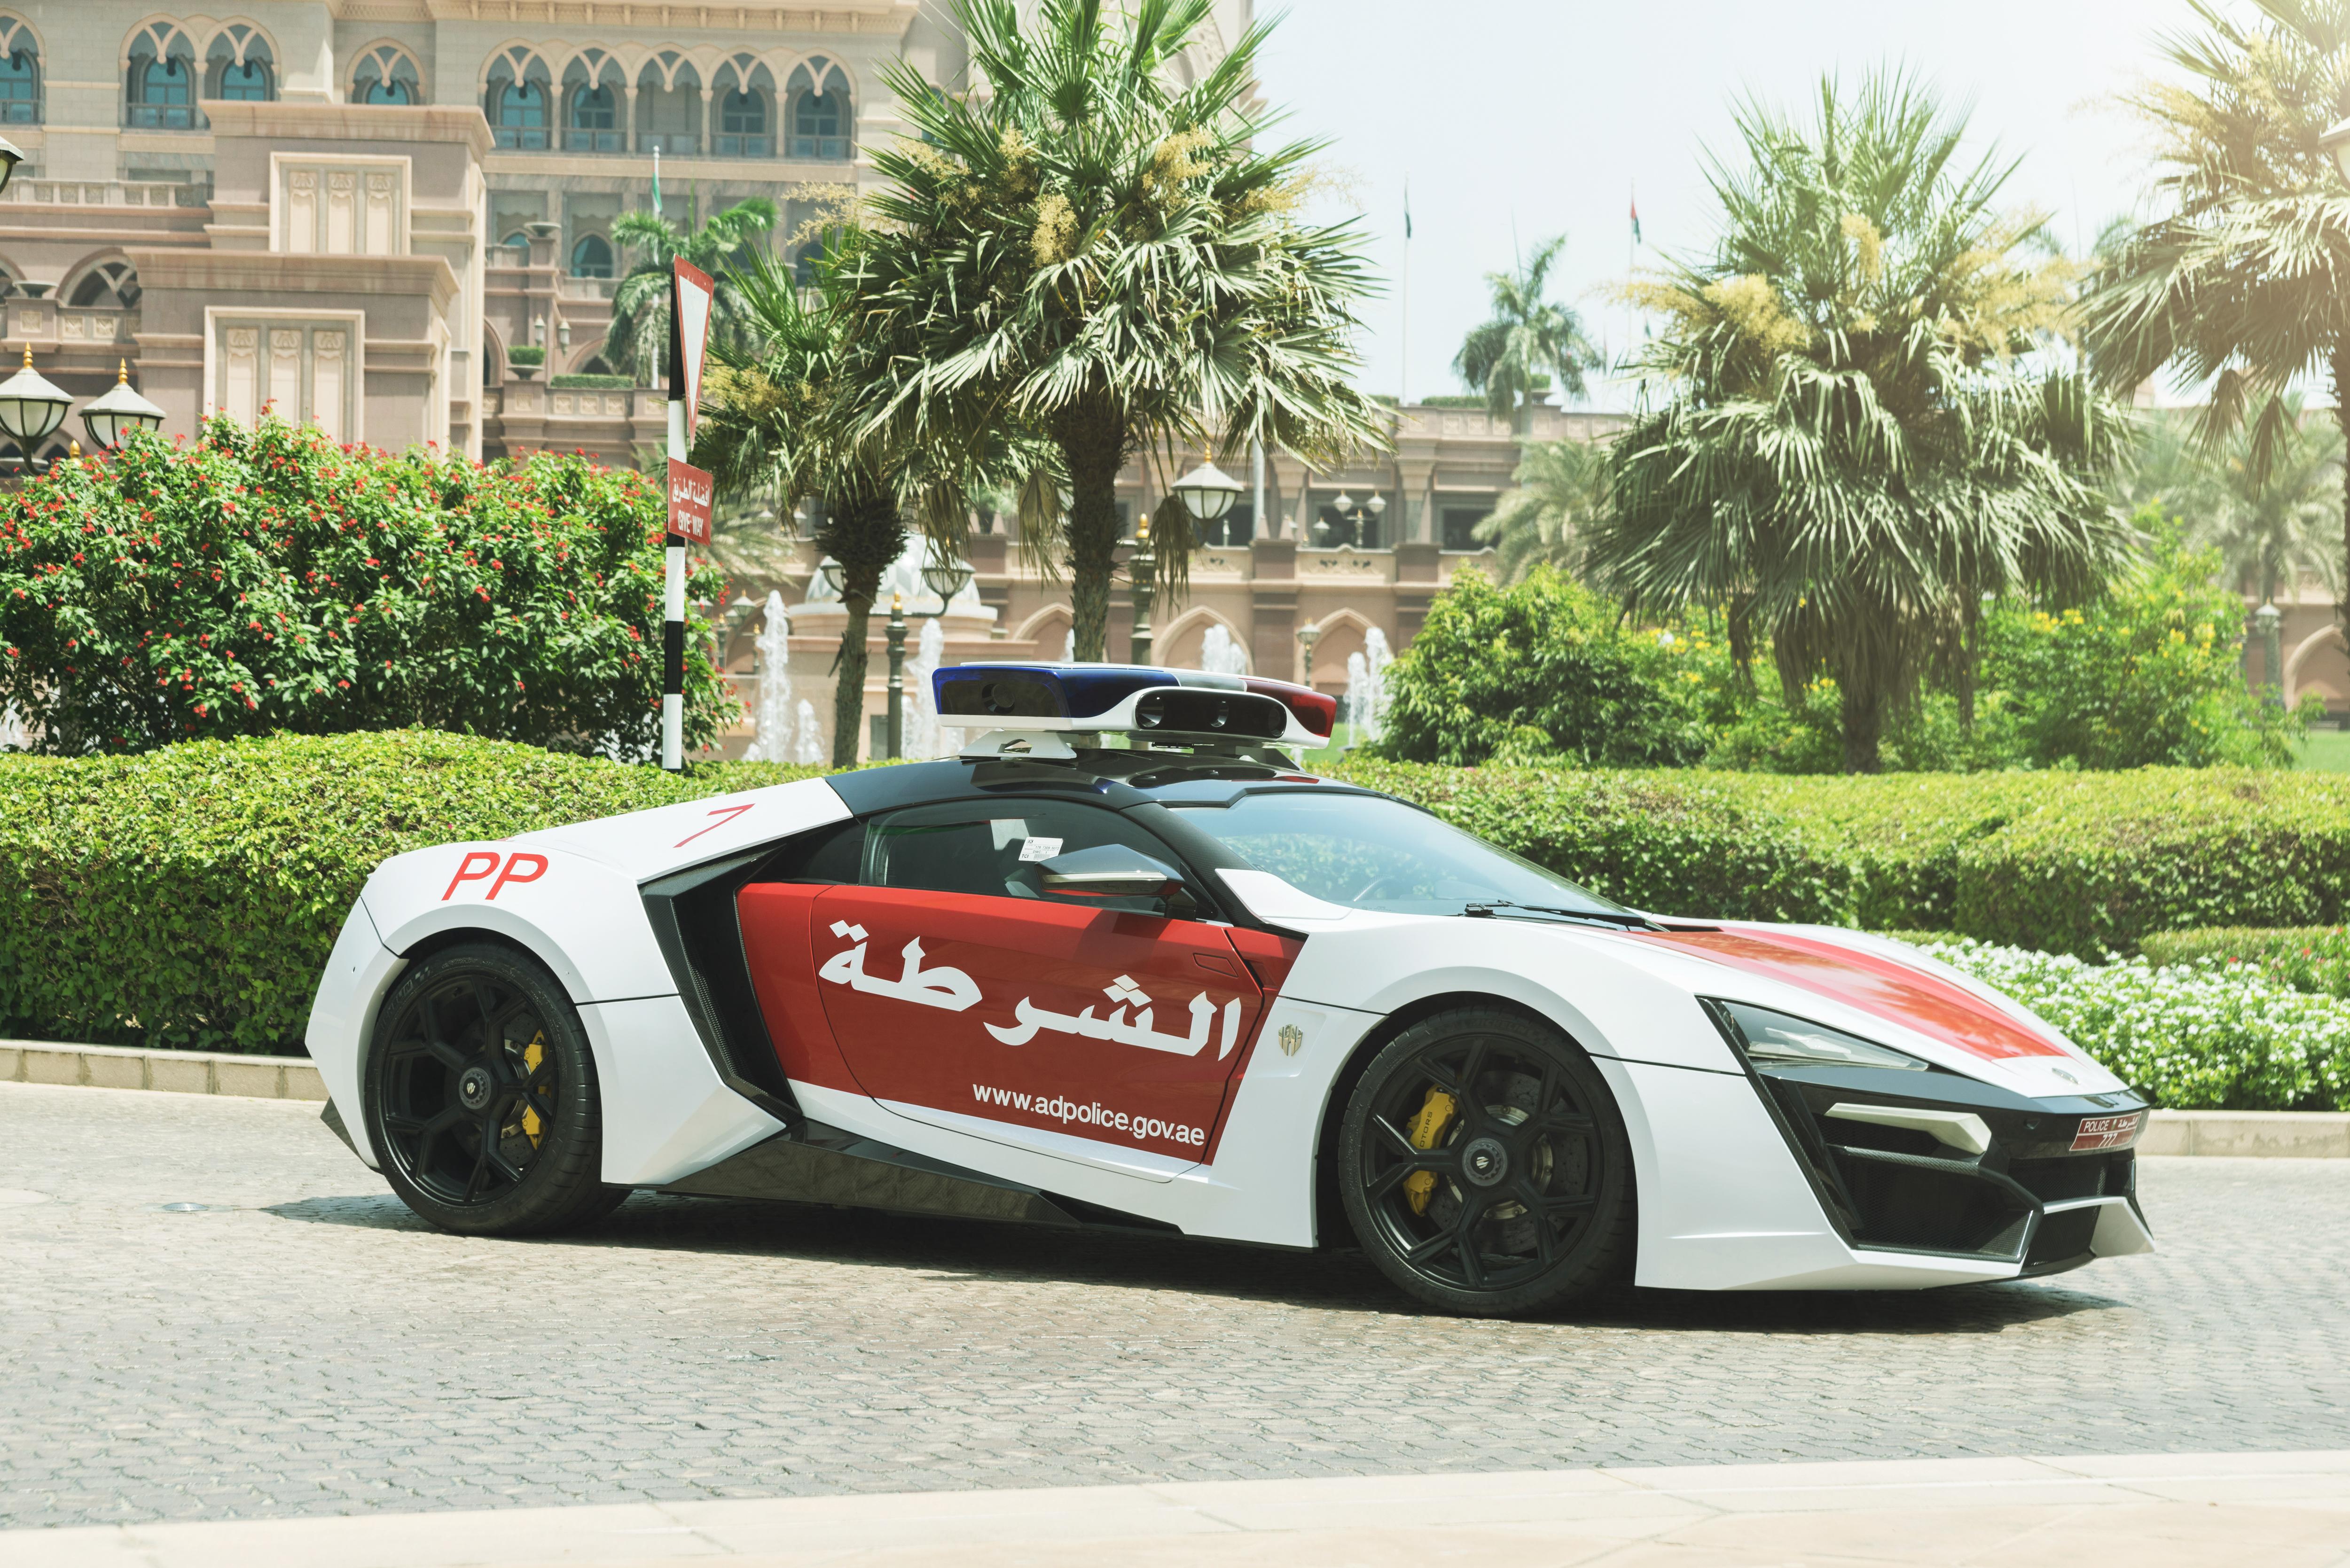 Lykan HyperSport. This particular vehicle belongs to the Abu Dhabi Police.